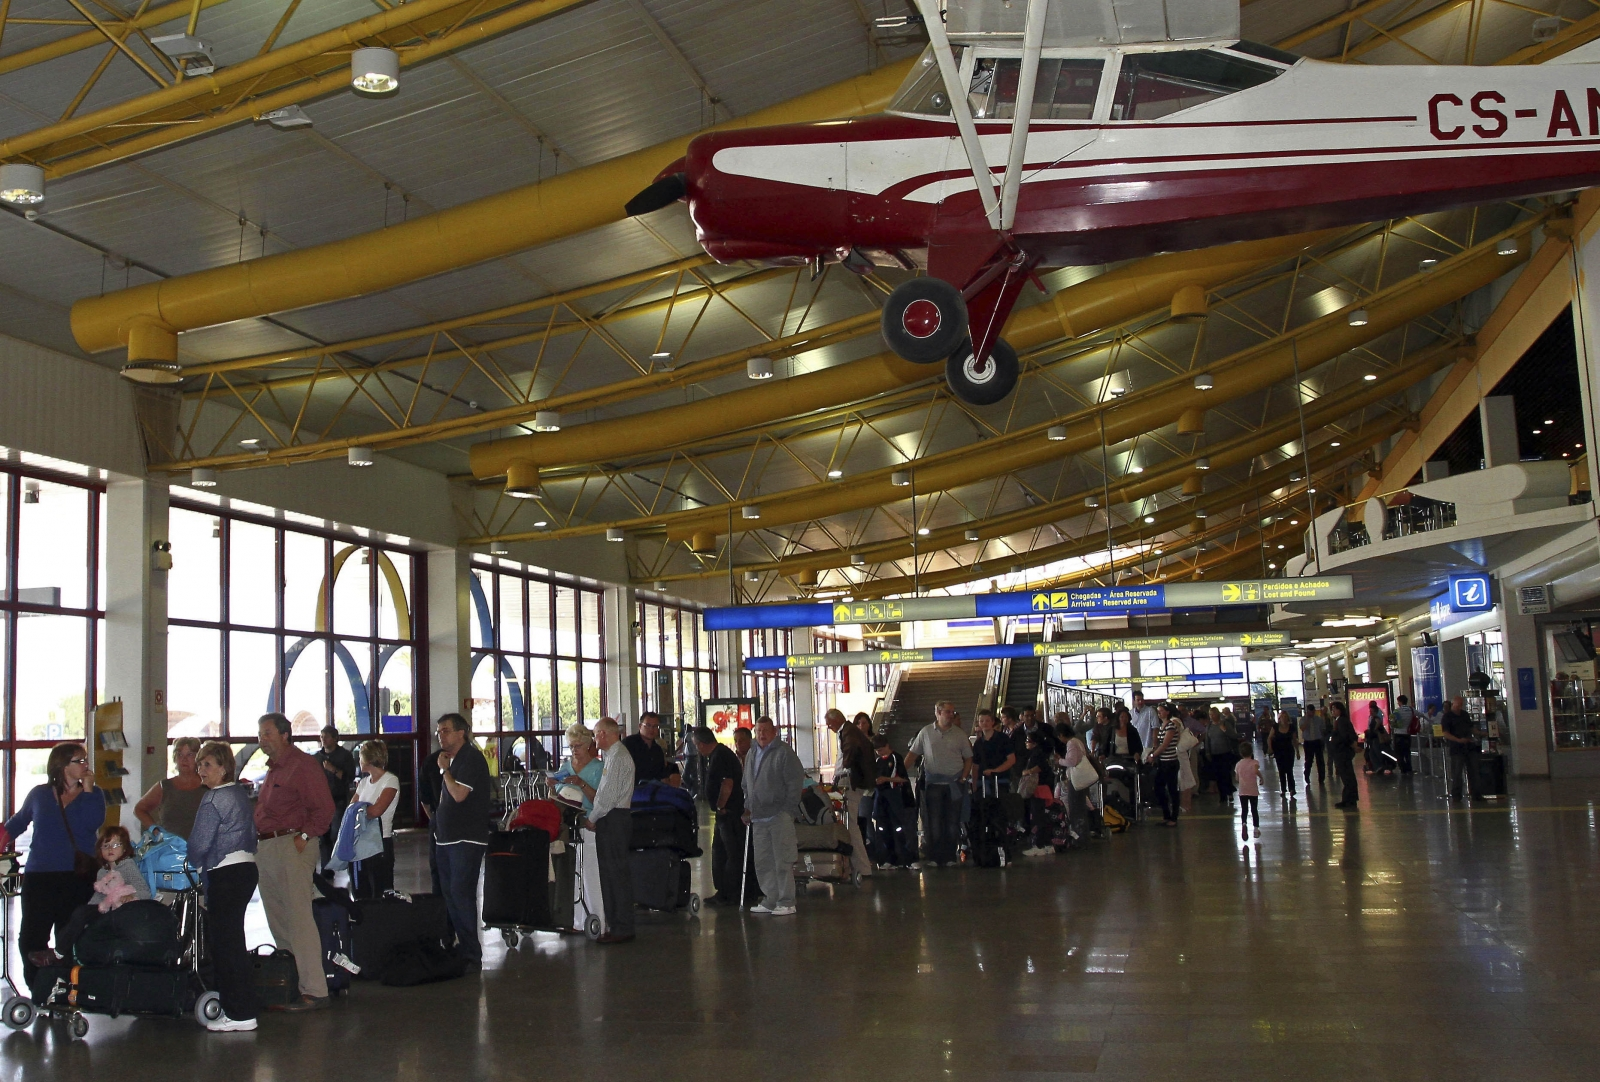 Faro Airport in the Algarve